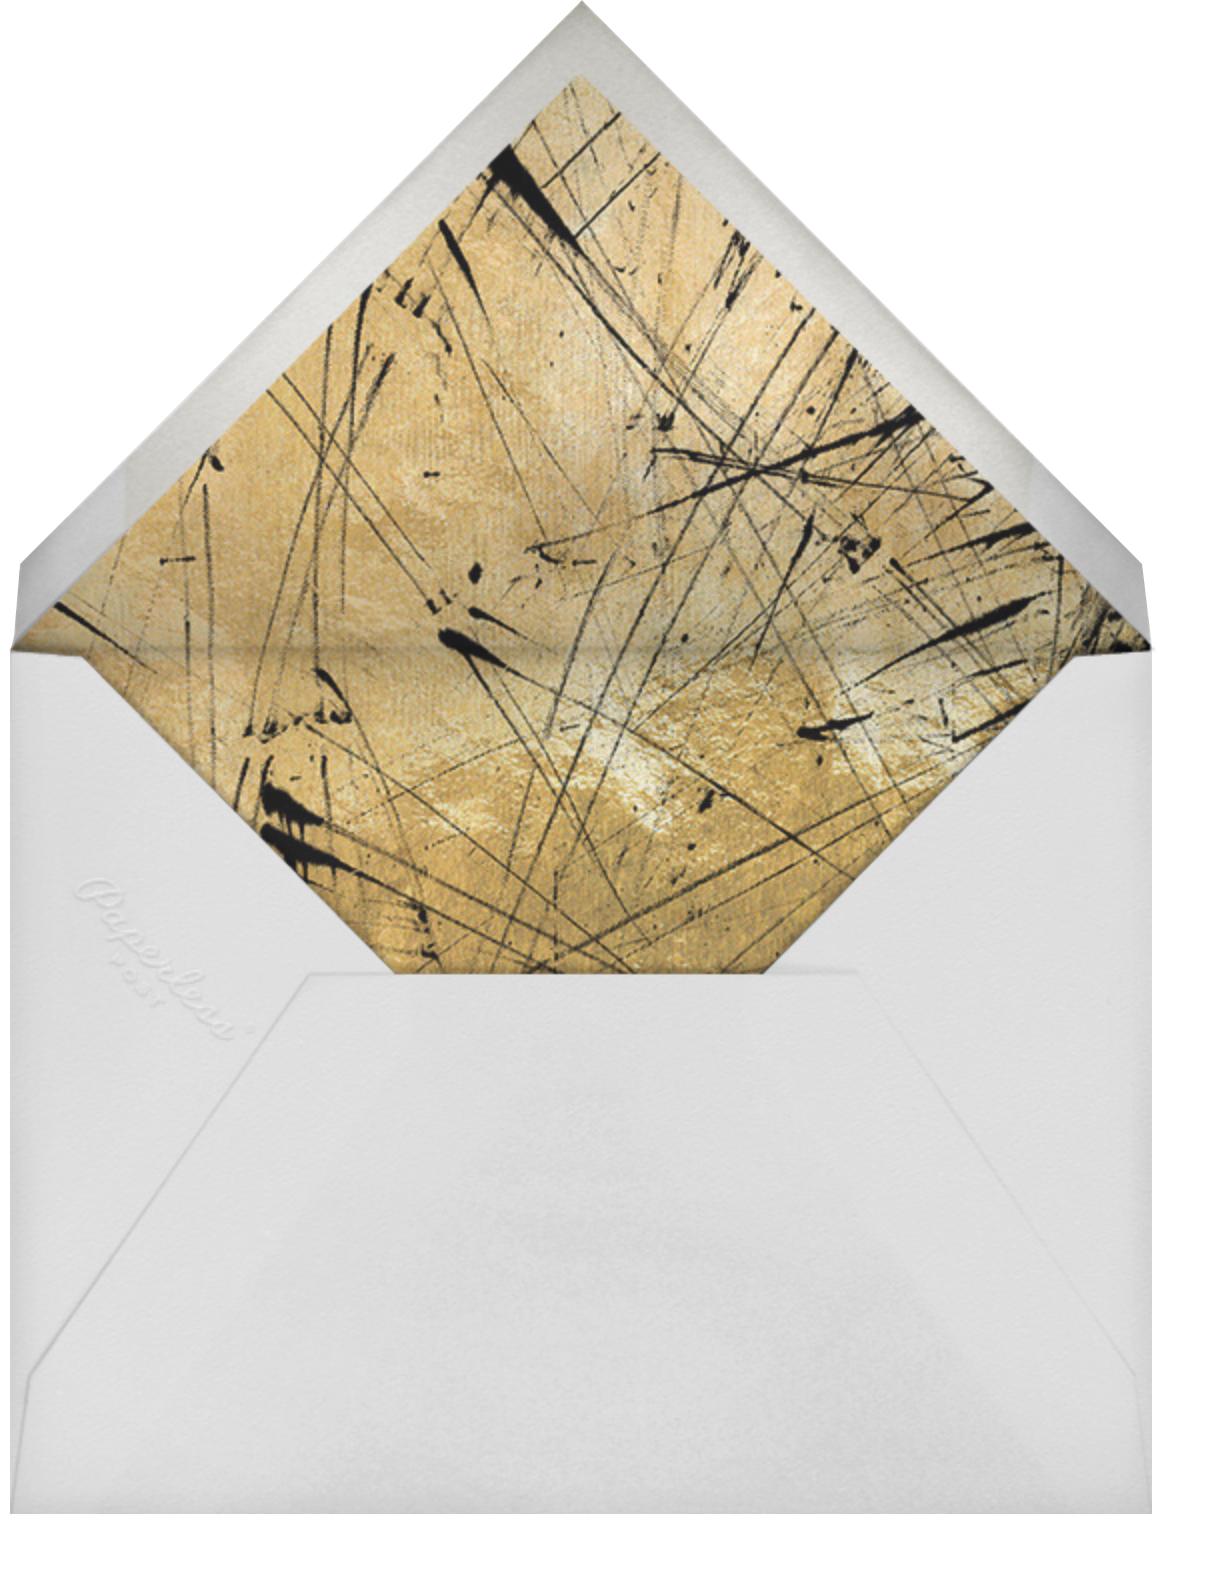 Mezzo Pearl - Black - Kelly Wearstler - New Year's Eve - envelope back